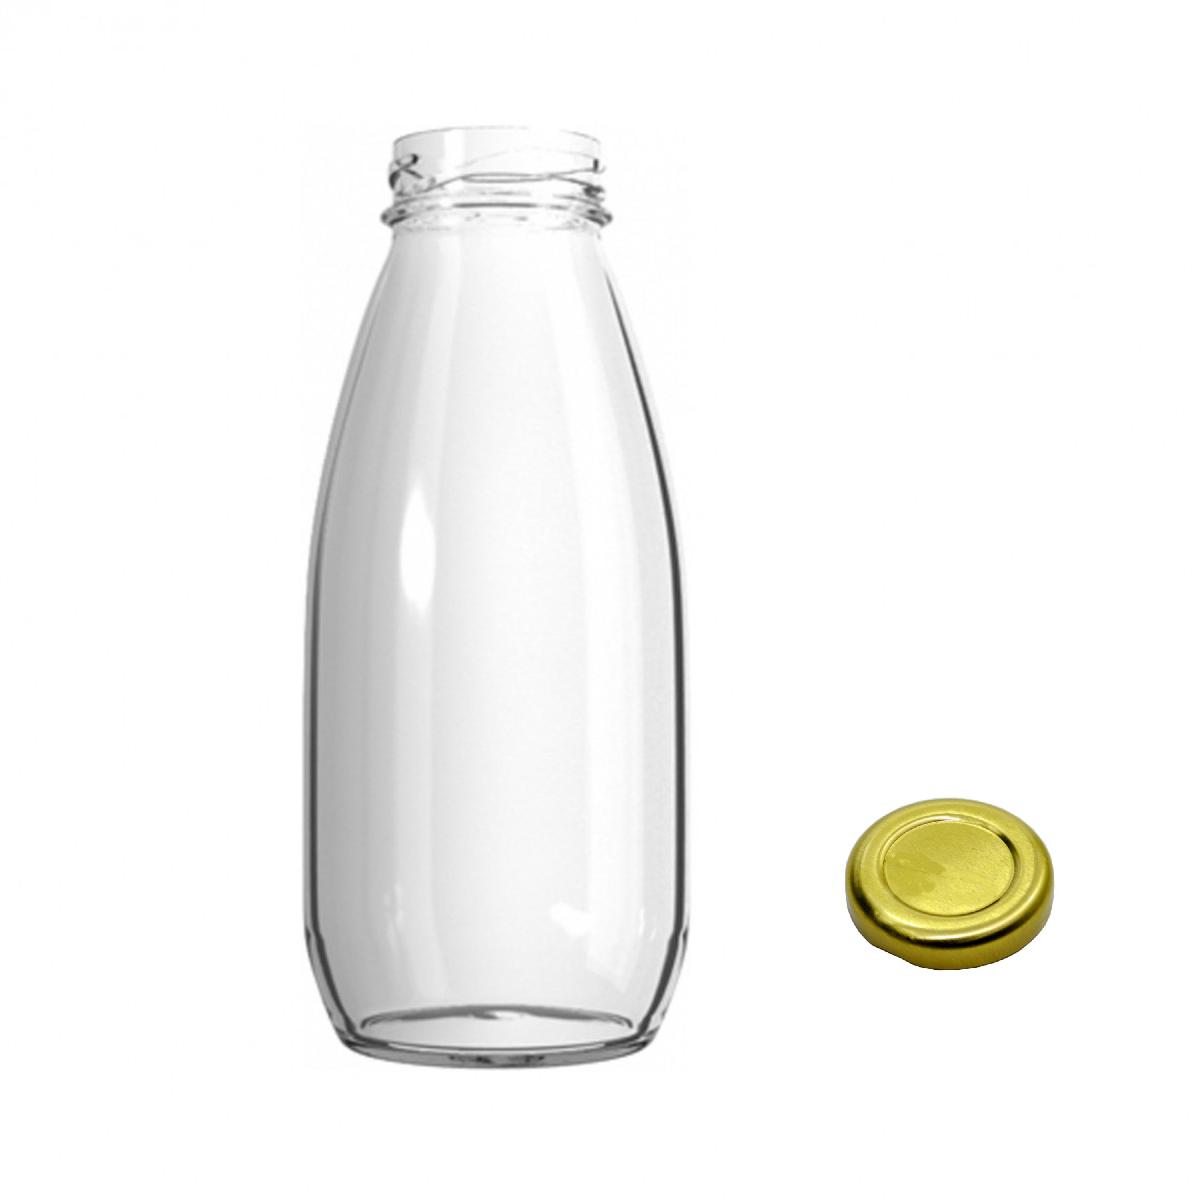 24 Garrafas De Vidro 300ml - Tampa Dourada -  Para Suco, Brindes, Doces, etc